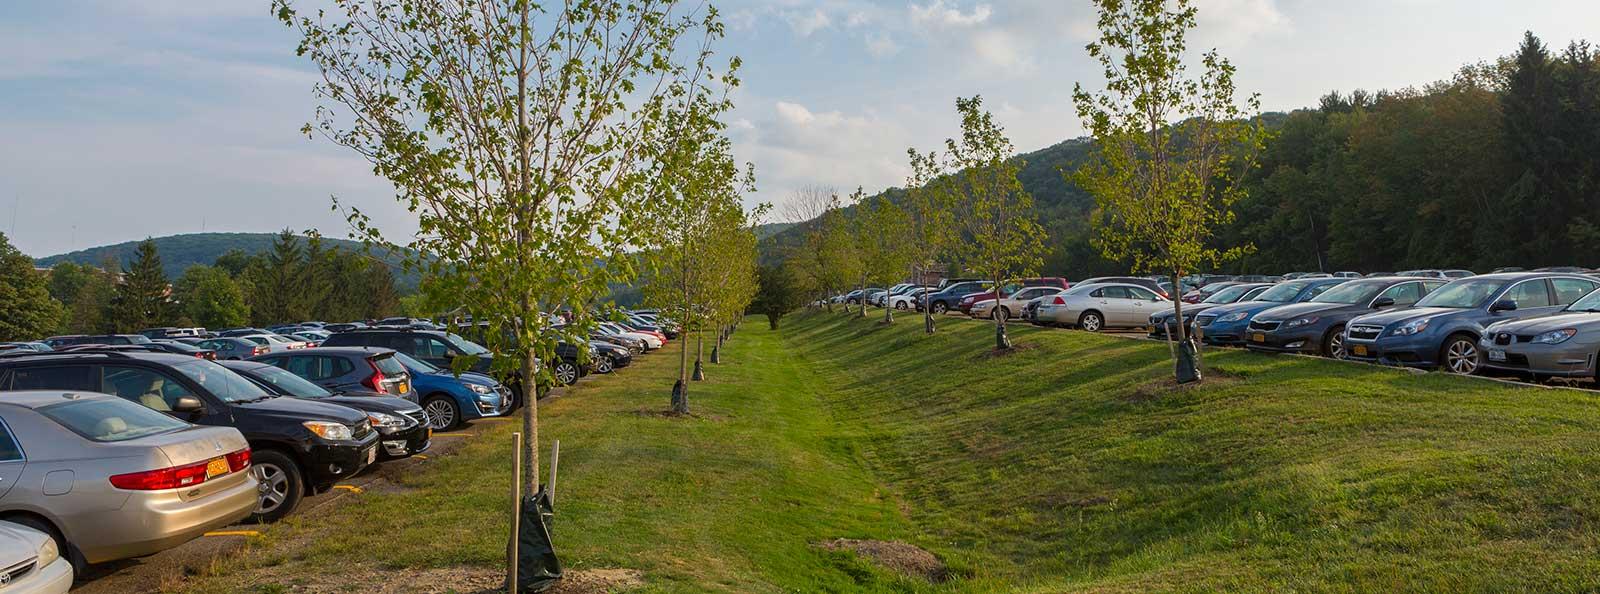 Image Gallery Suny Binghamton Parking